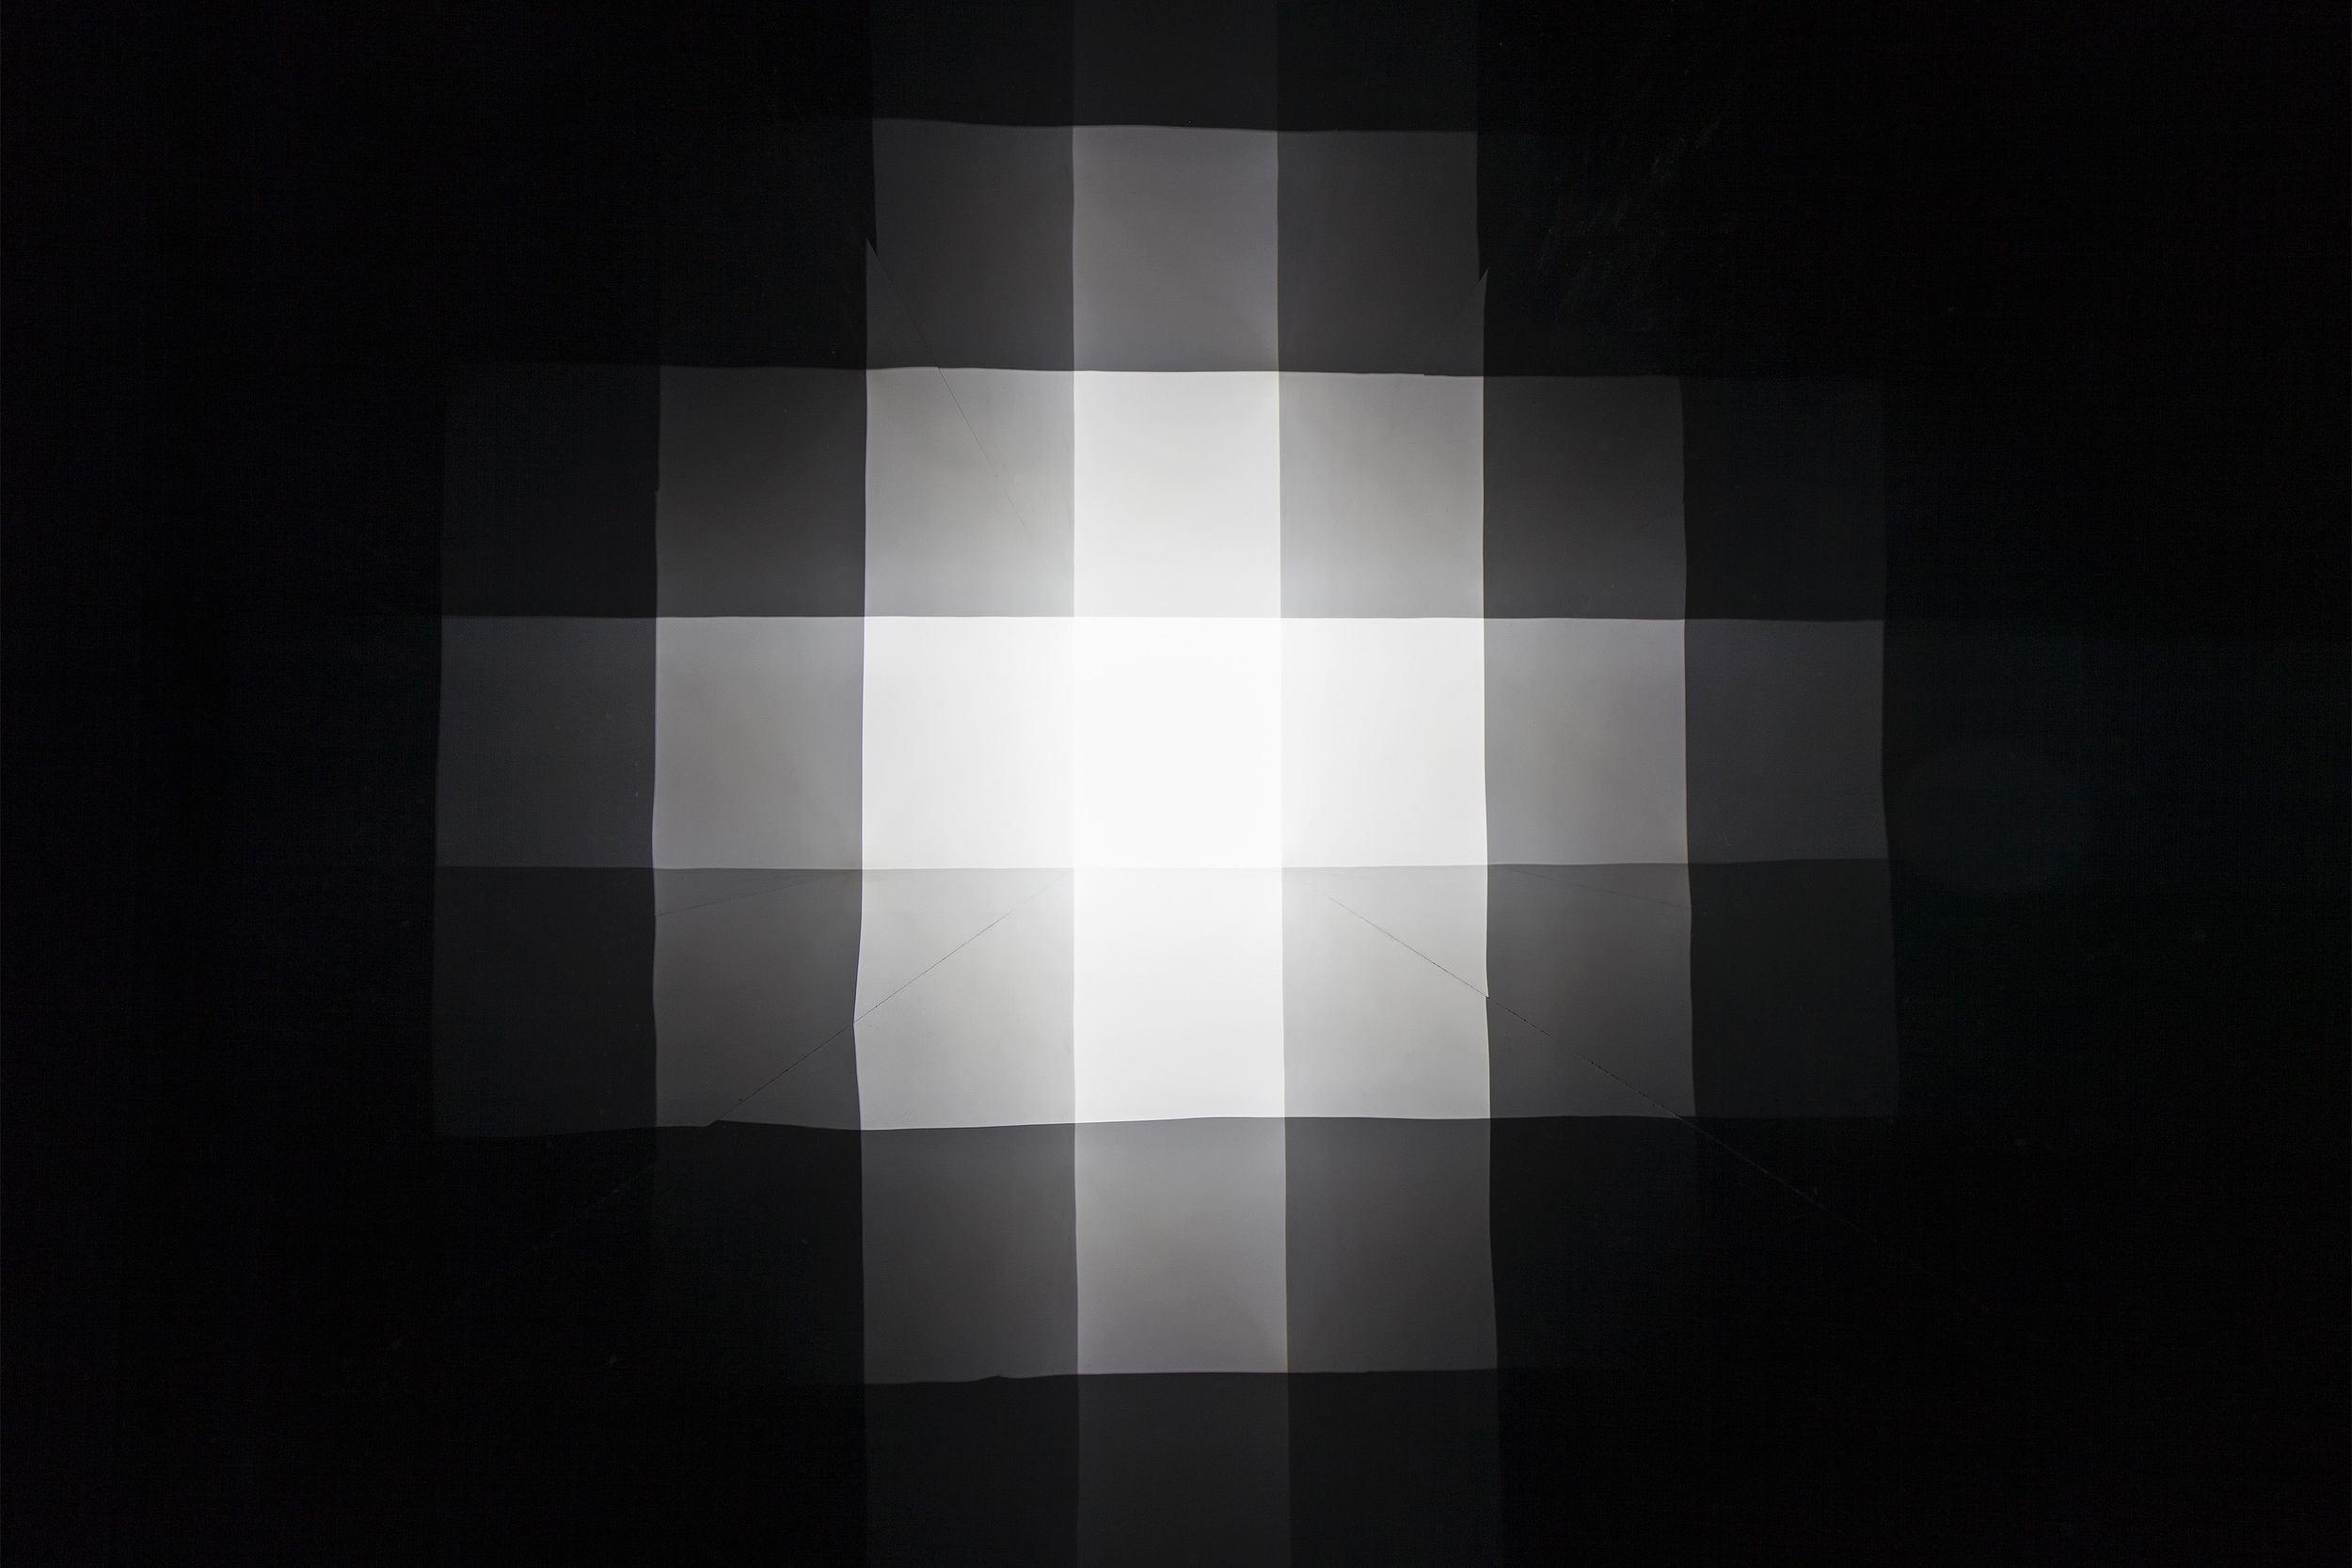 Specular Reflection (black)